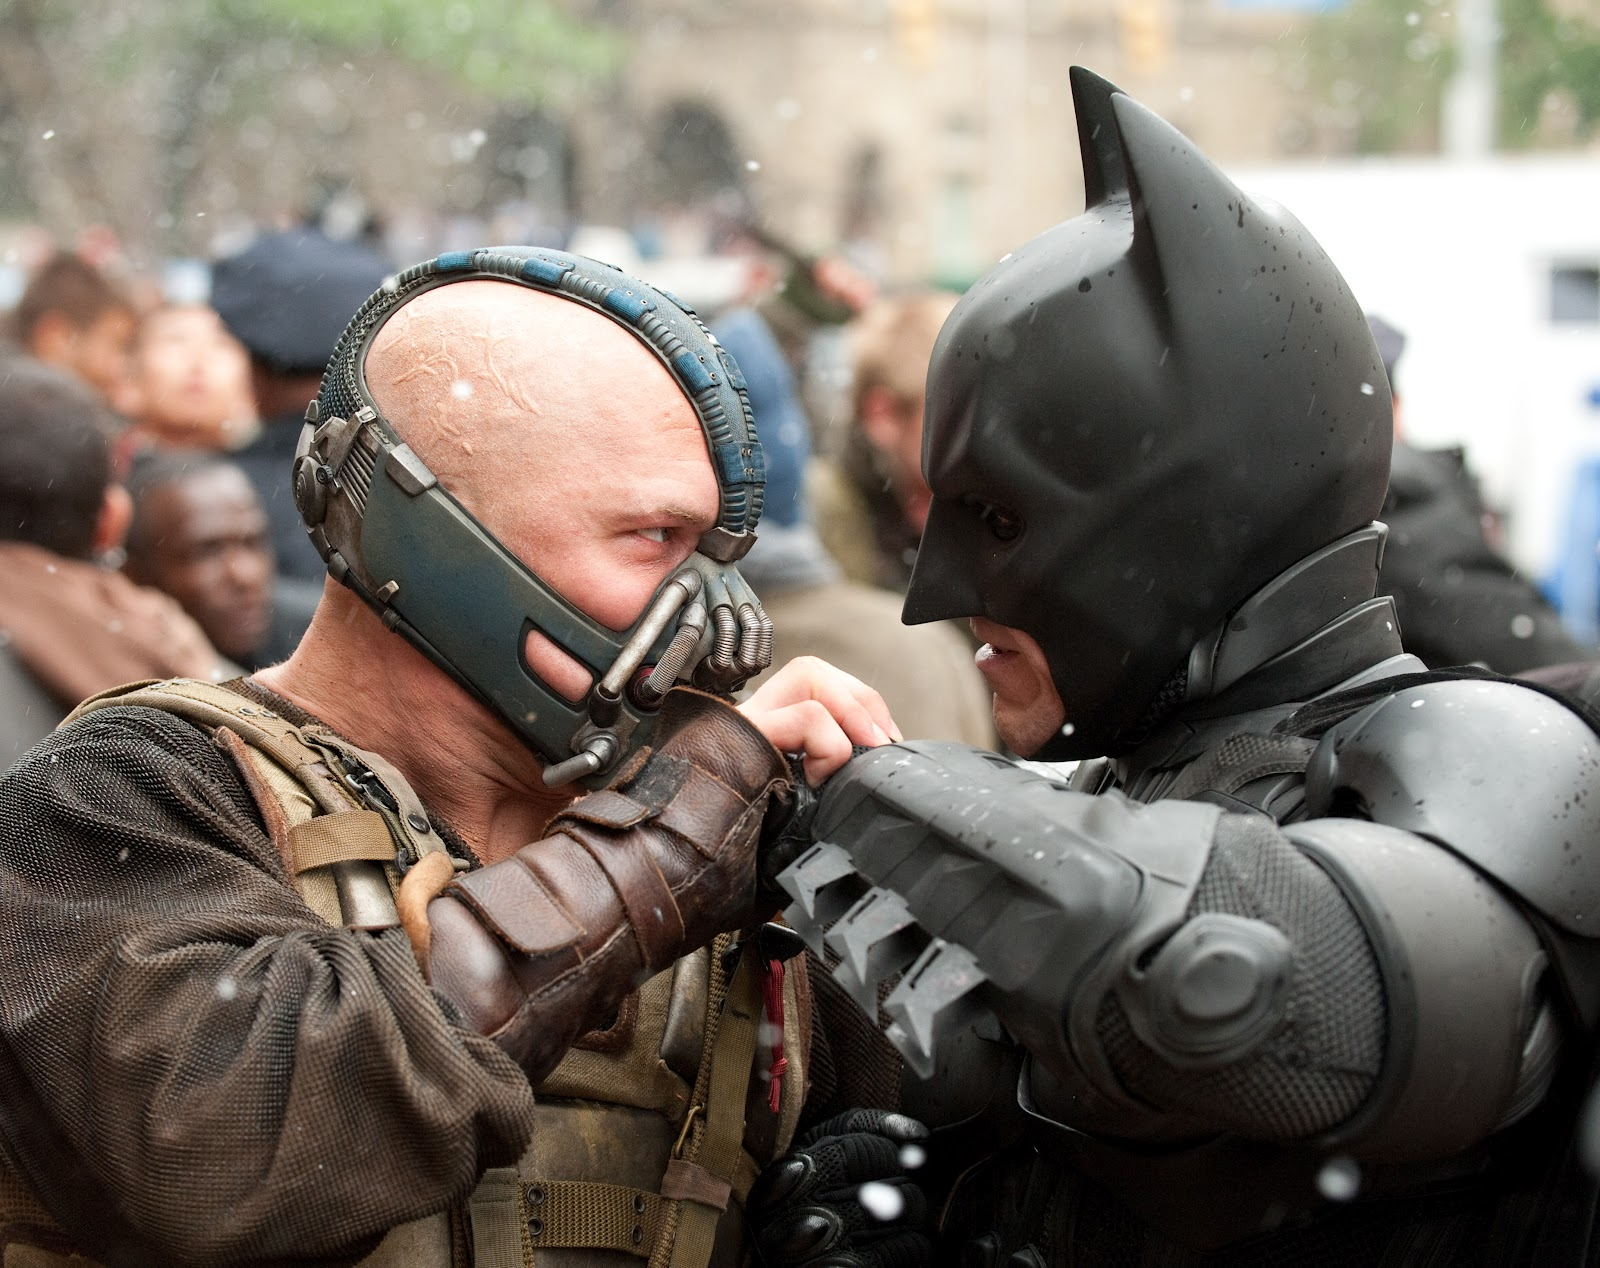 http://4.bp.blogspot.com/-dhUEzIiRxFY/T9zarVJEh_I/AAAAAAAACL0/EHSdUmK2kmE/s1600/Bane_vs_Batman_The_Dark_Knight_Rises_2012_HD_Wallpaper-Vvallpaper.Net.jpg